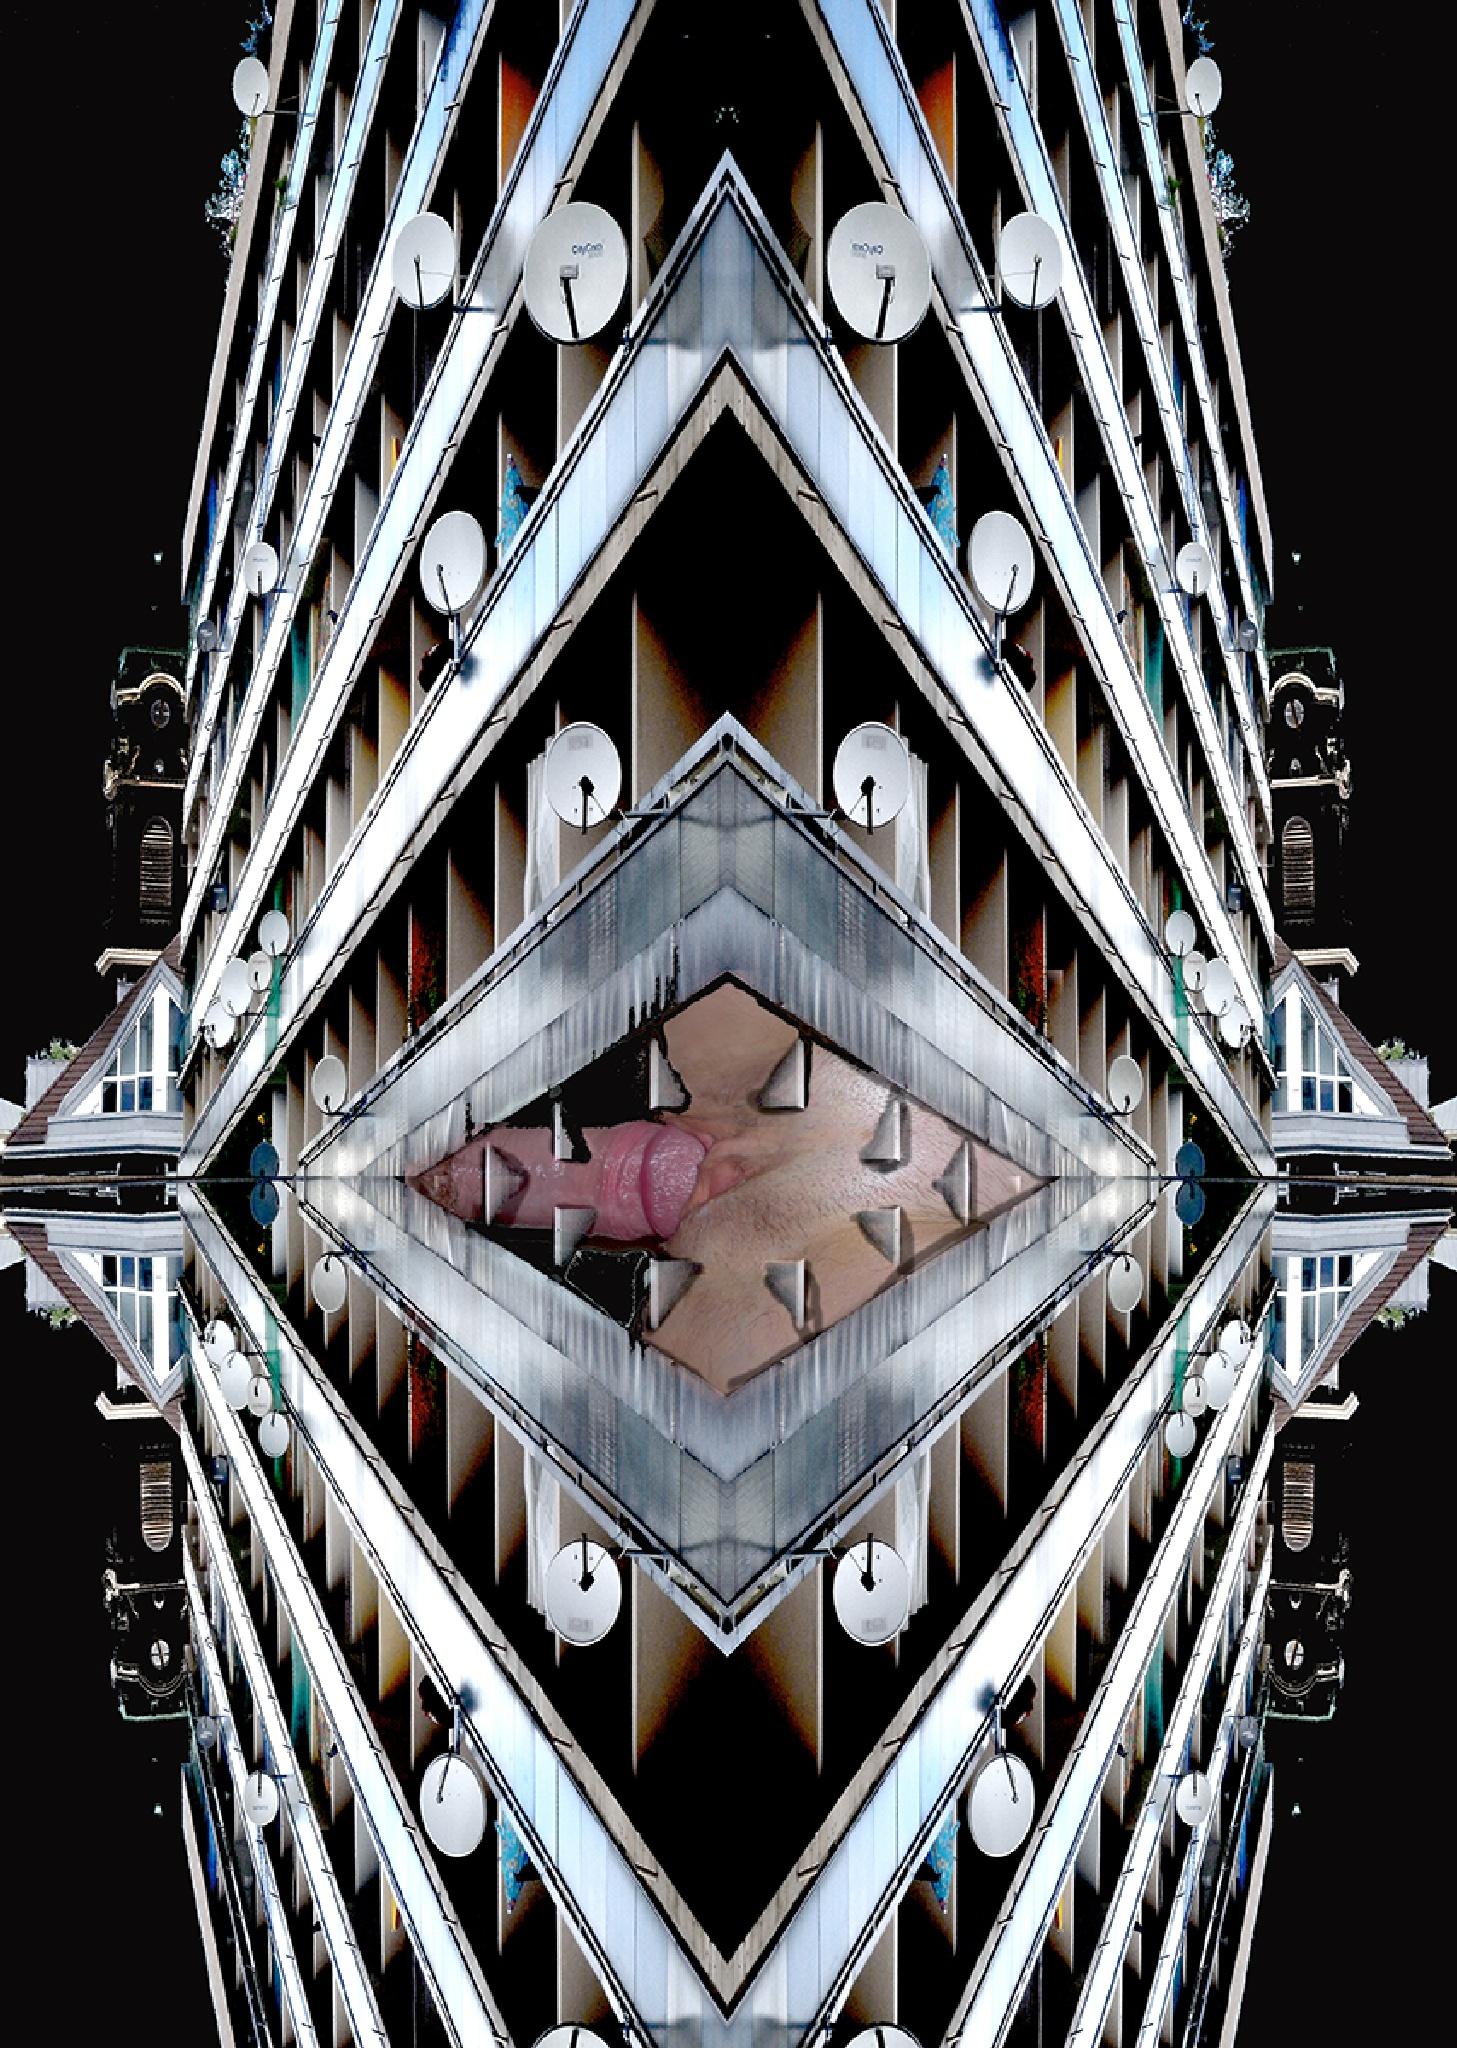 TV-satellite-porno-generator by michael eder fotografie